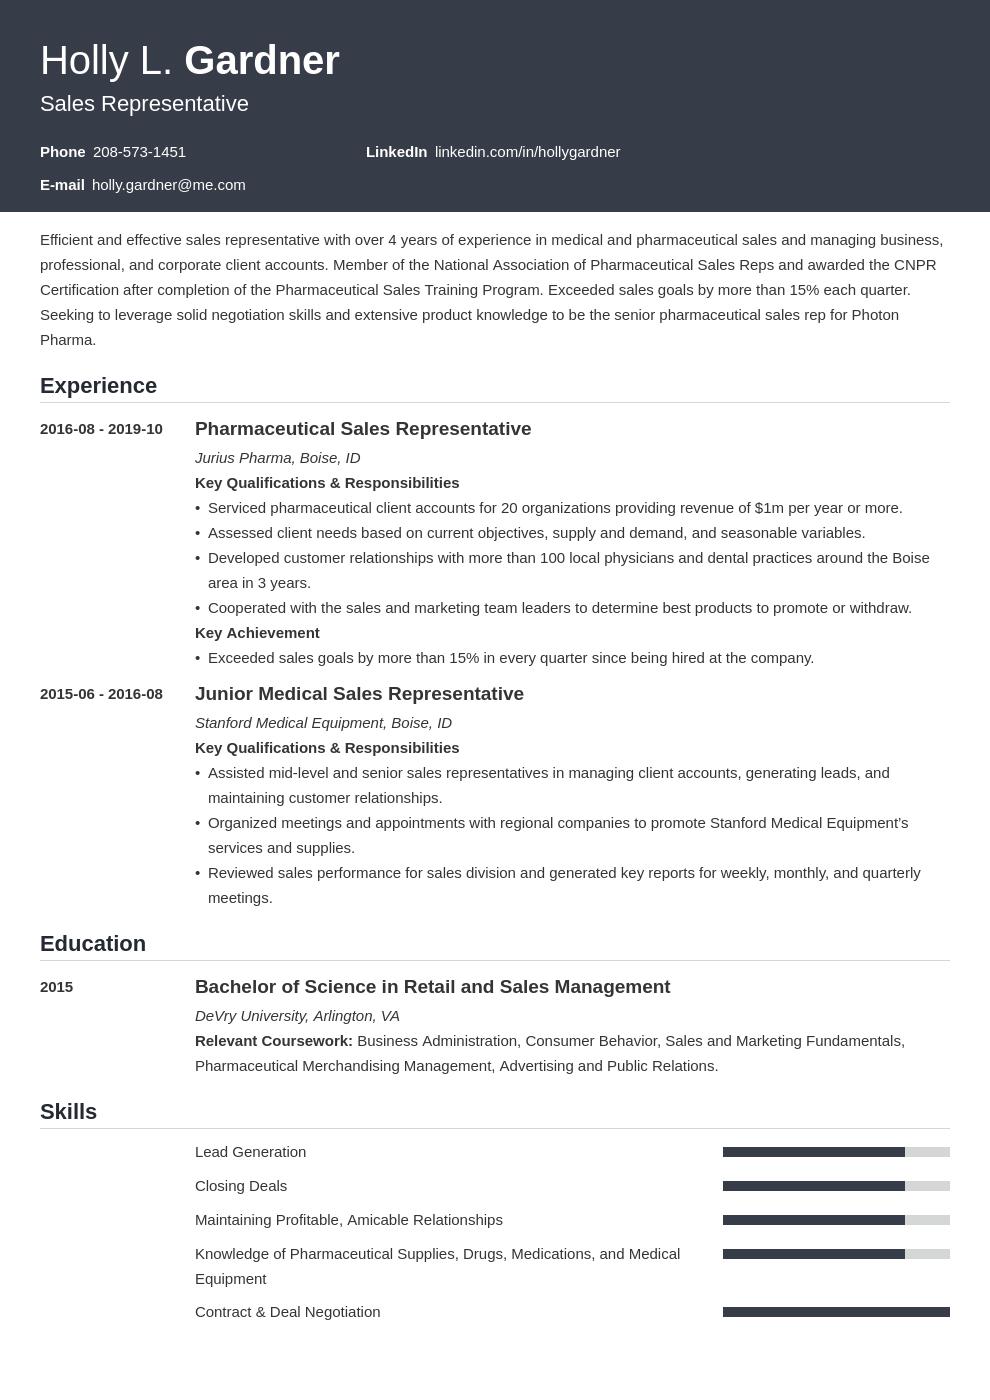 sales representative resume example template influx in